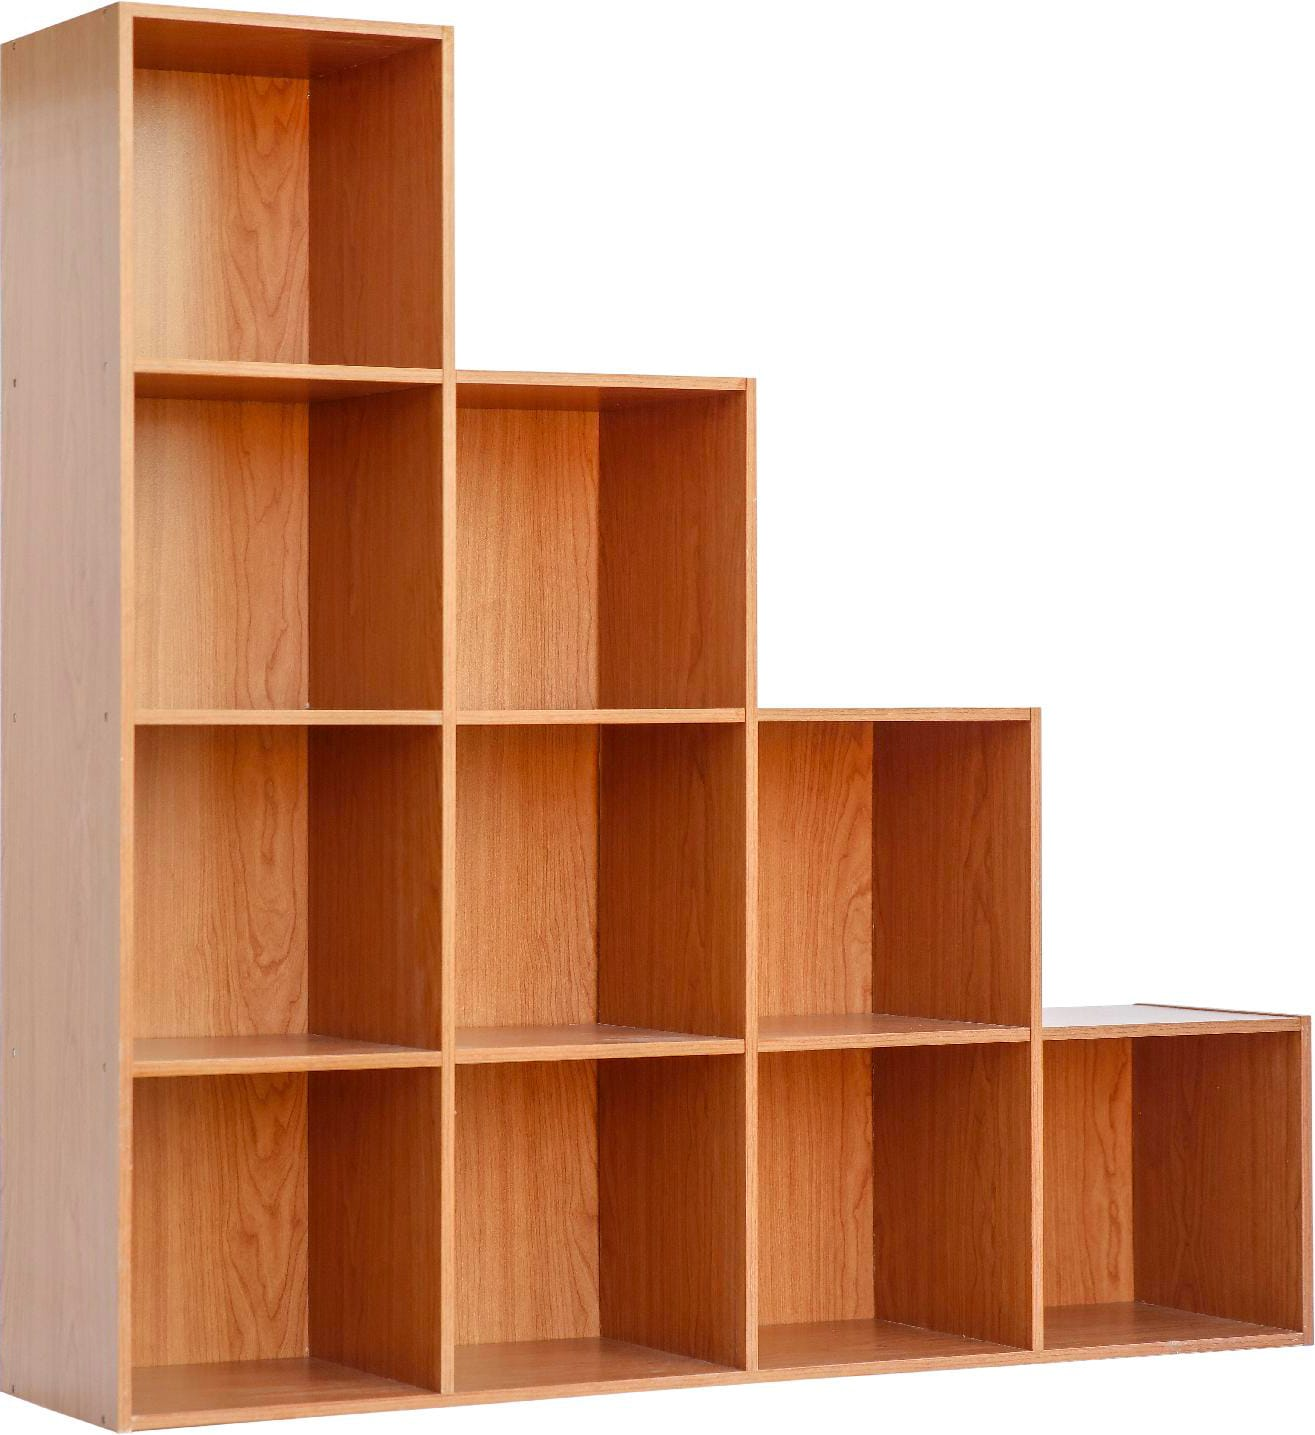 1 Anta Libreria Kit Closet Venezia